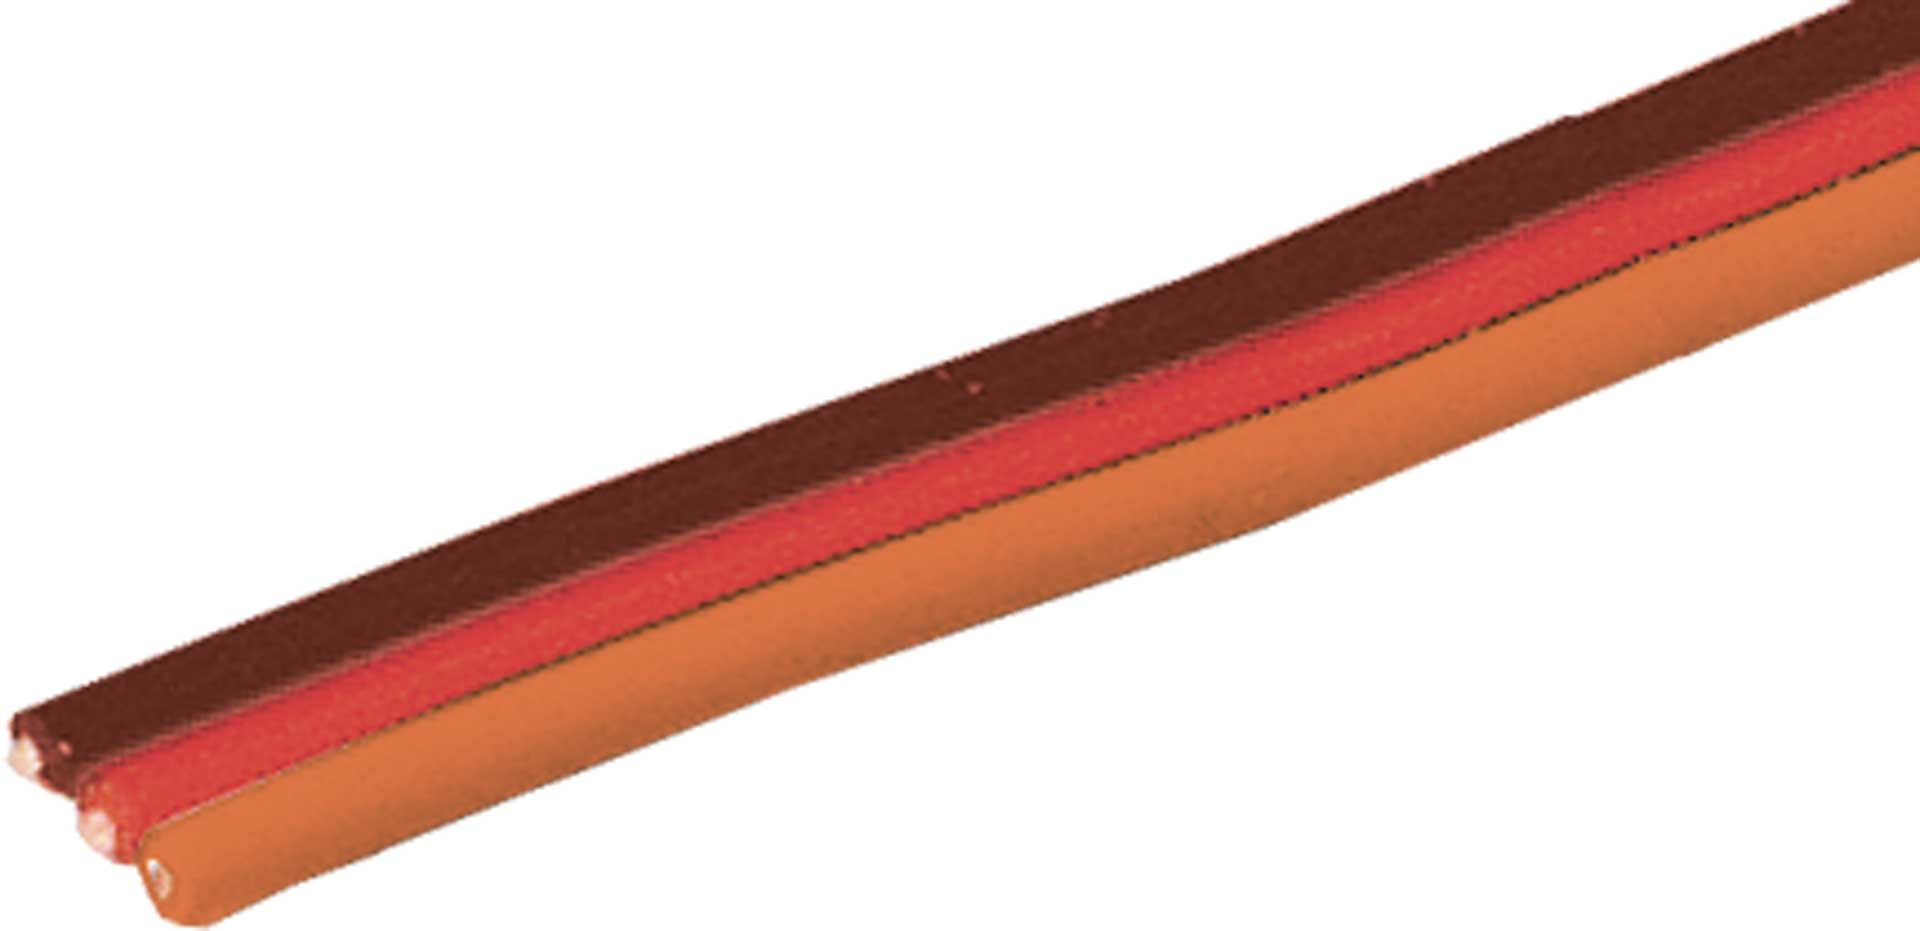 Robbe Modellsport Servokabel Graupner/JR/Uni 50 Meter flach 0,5mm² (20AWG) PVC Meterware